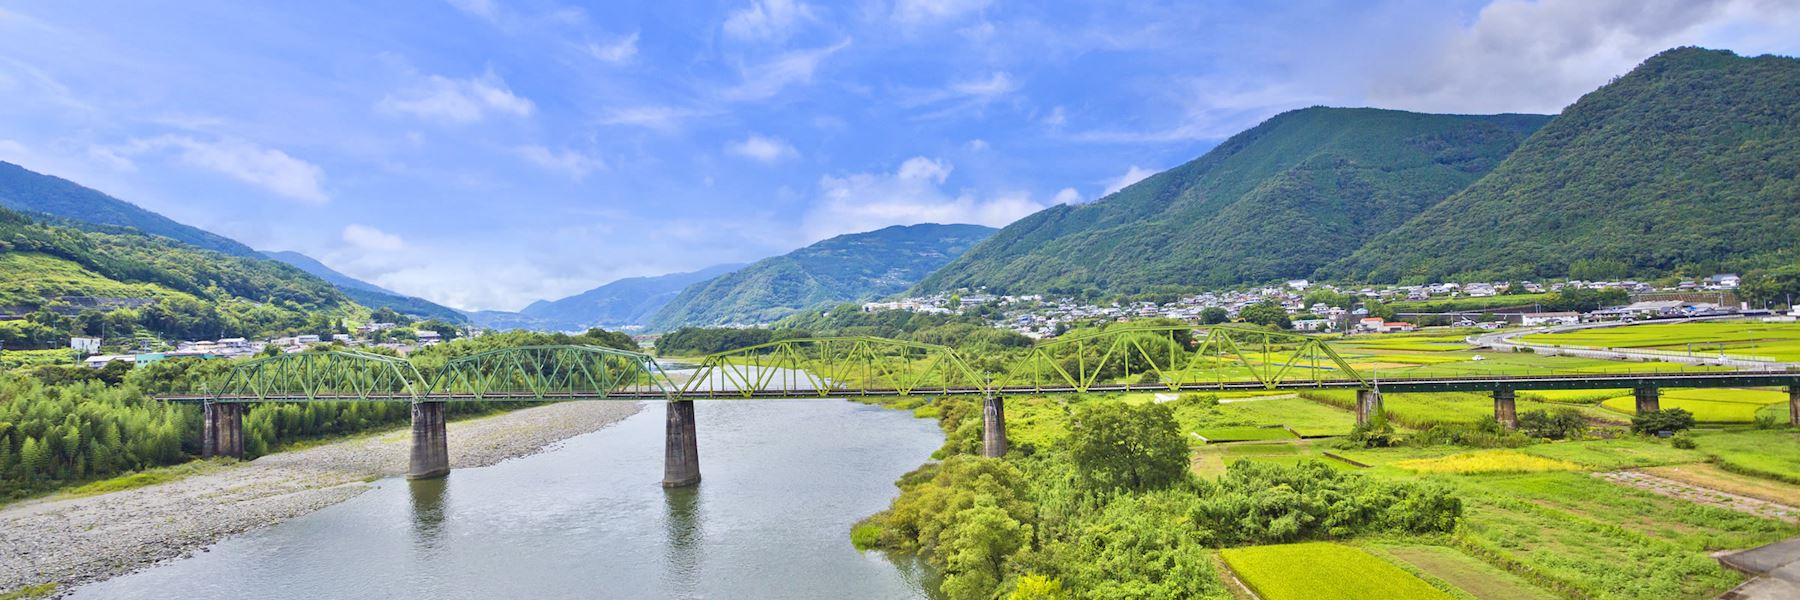 Visit Iya Valley, Japan